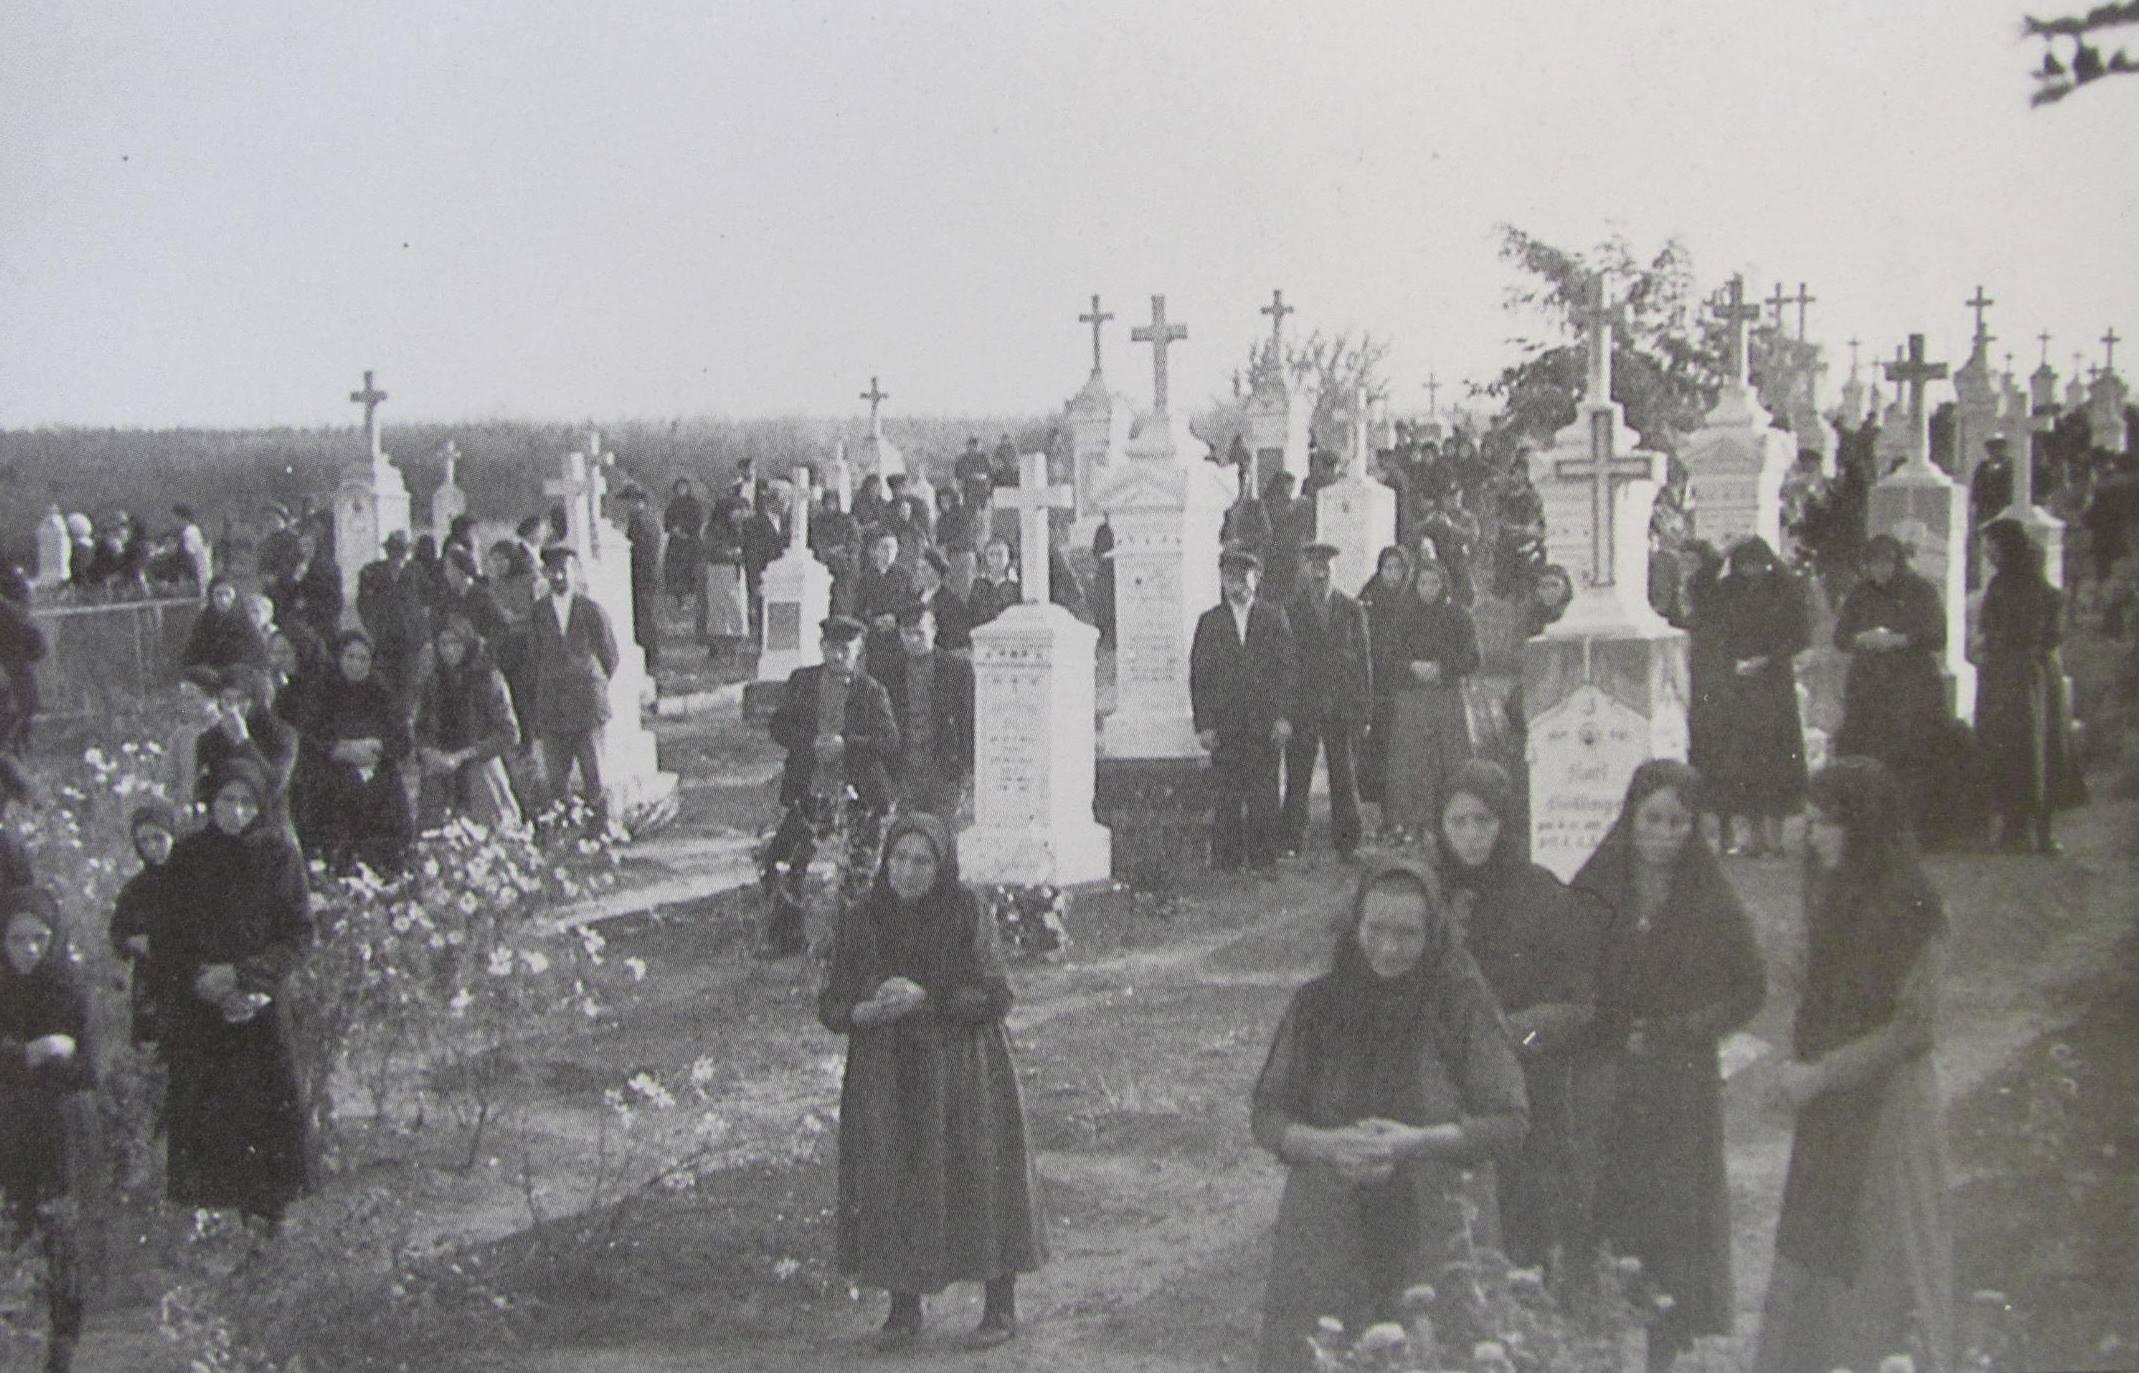 Hoffnungstal, Bessarabia - History of a German Village